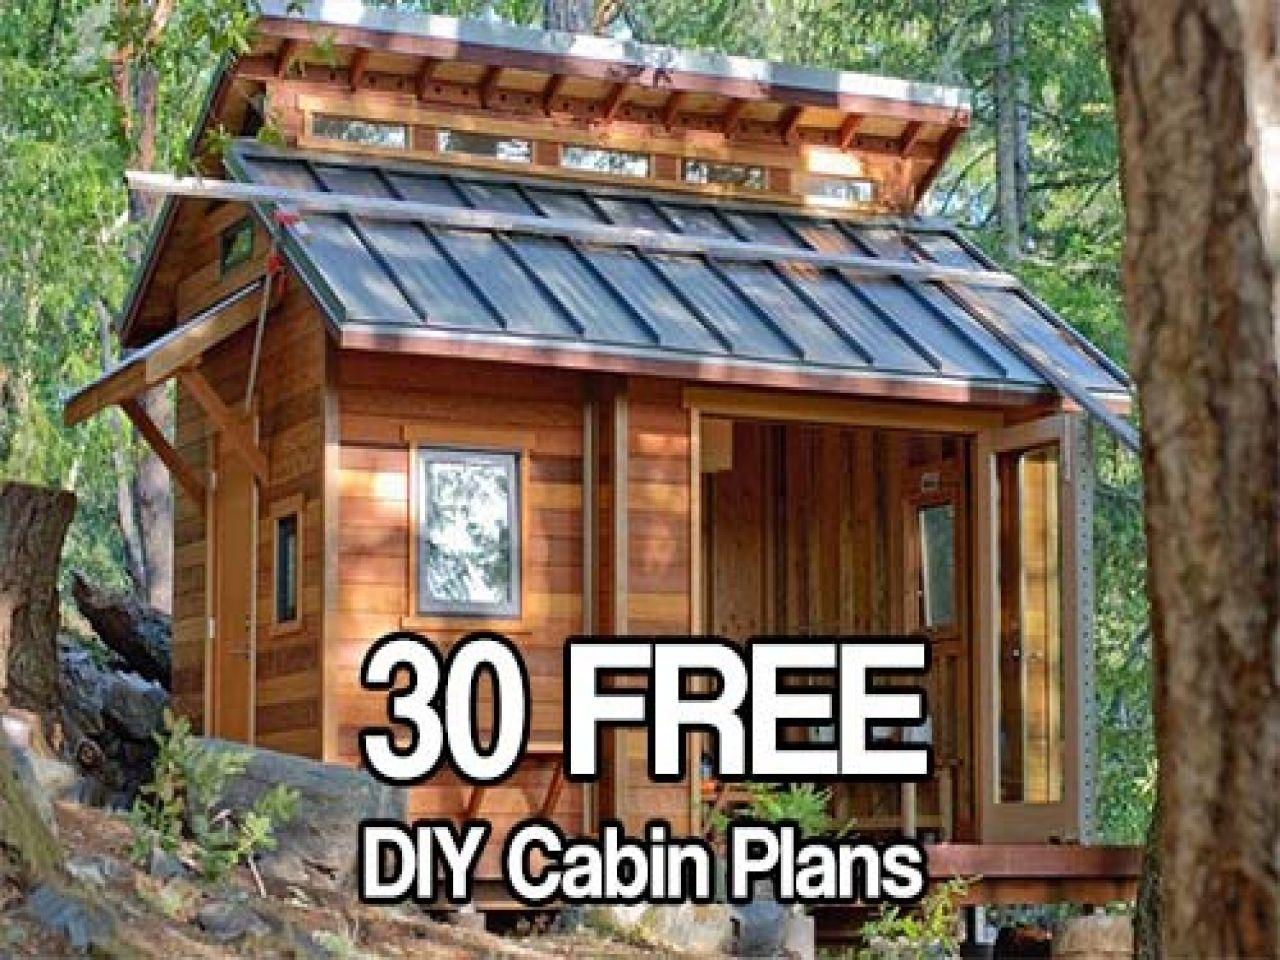 Small Cabin Building Plans Free Diy Get Idea From Tiny House Home Kehidupan Rumah Mungil Rumah Kayu Desain Rumah Mungil